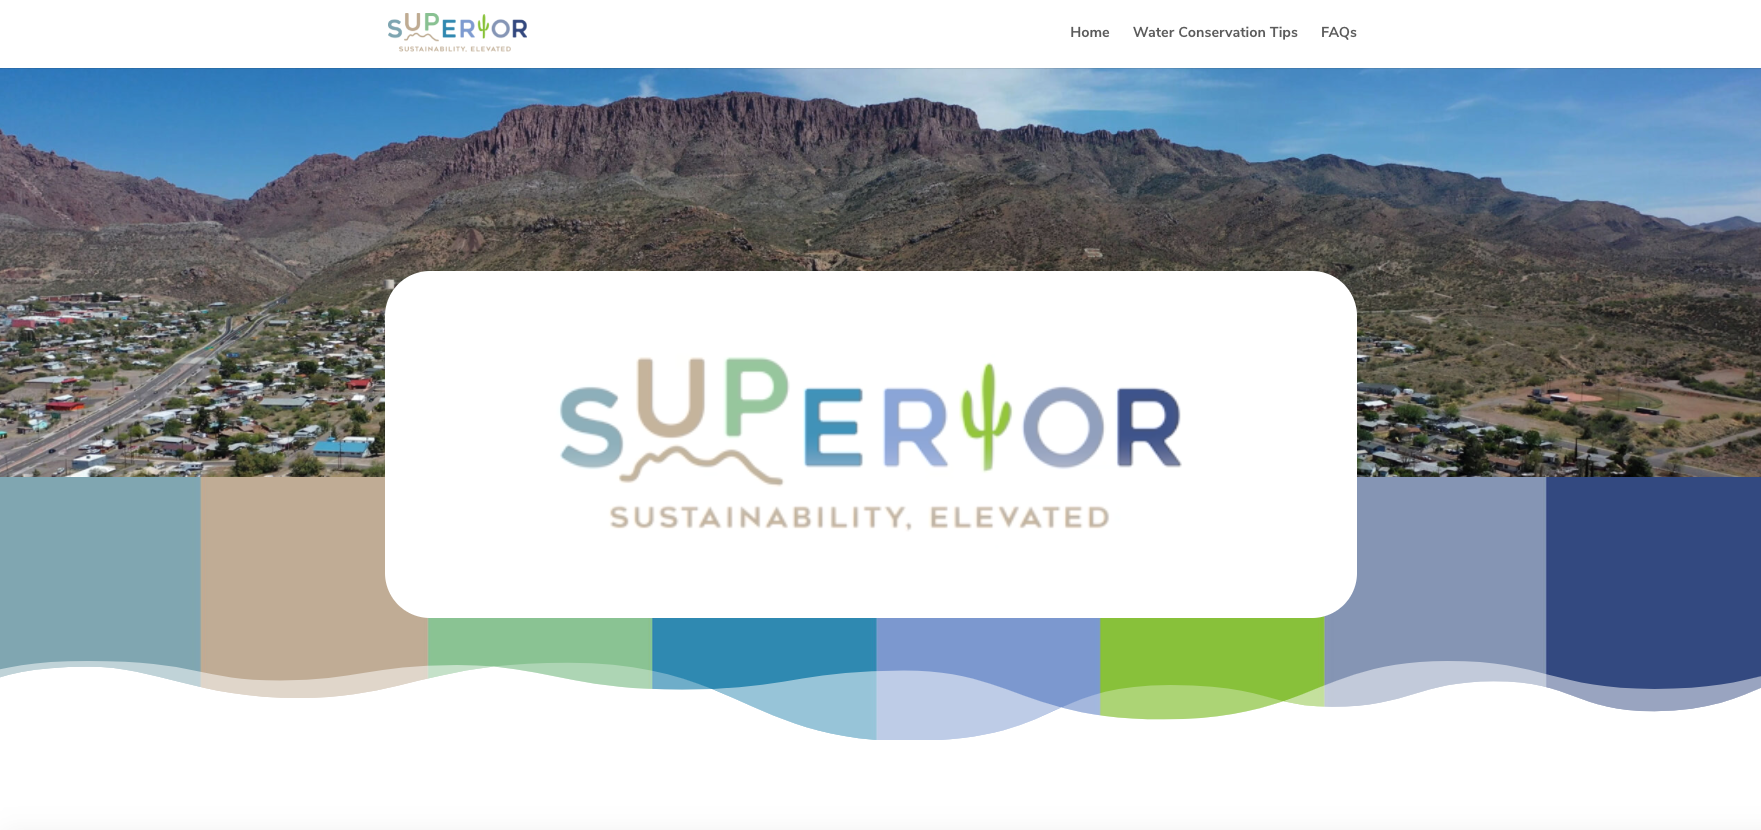 Superior Sustainability Elevated website